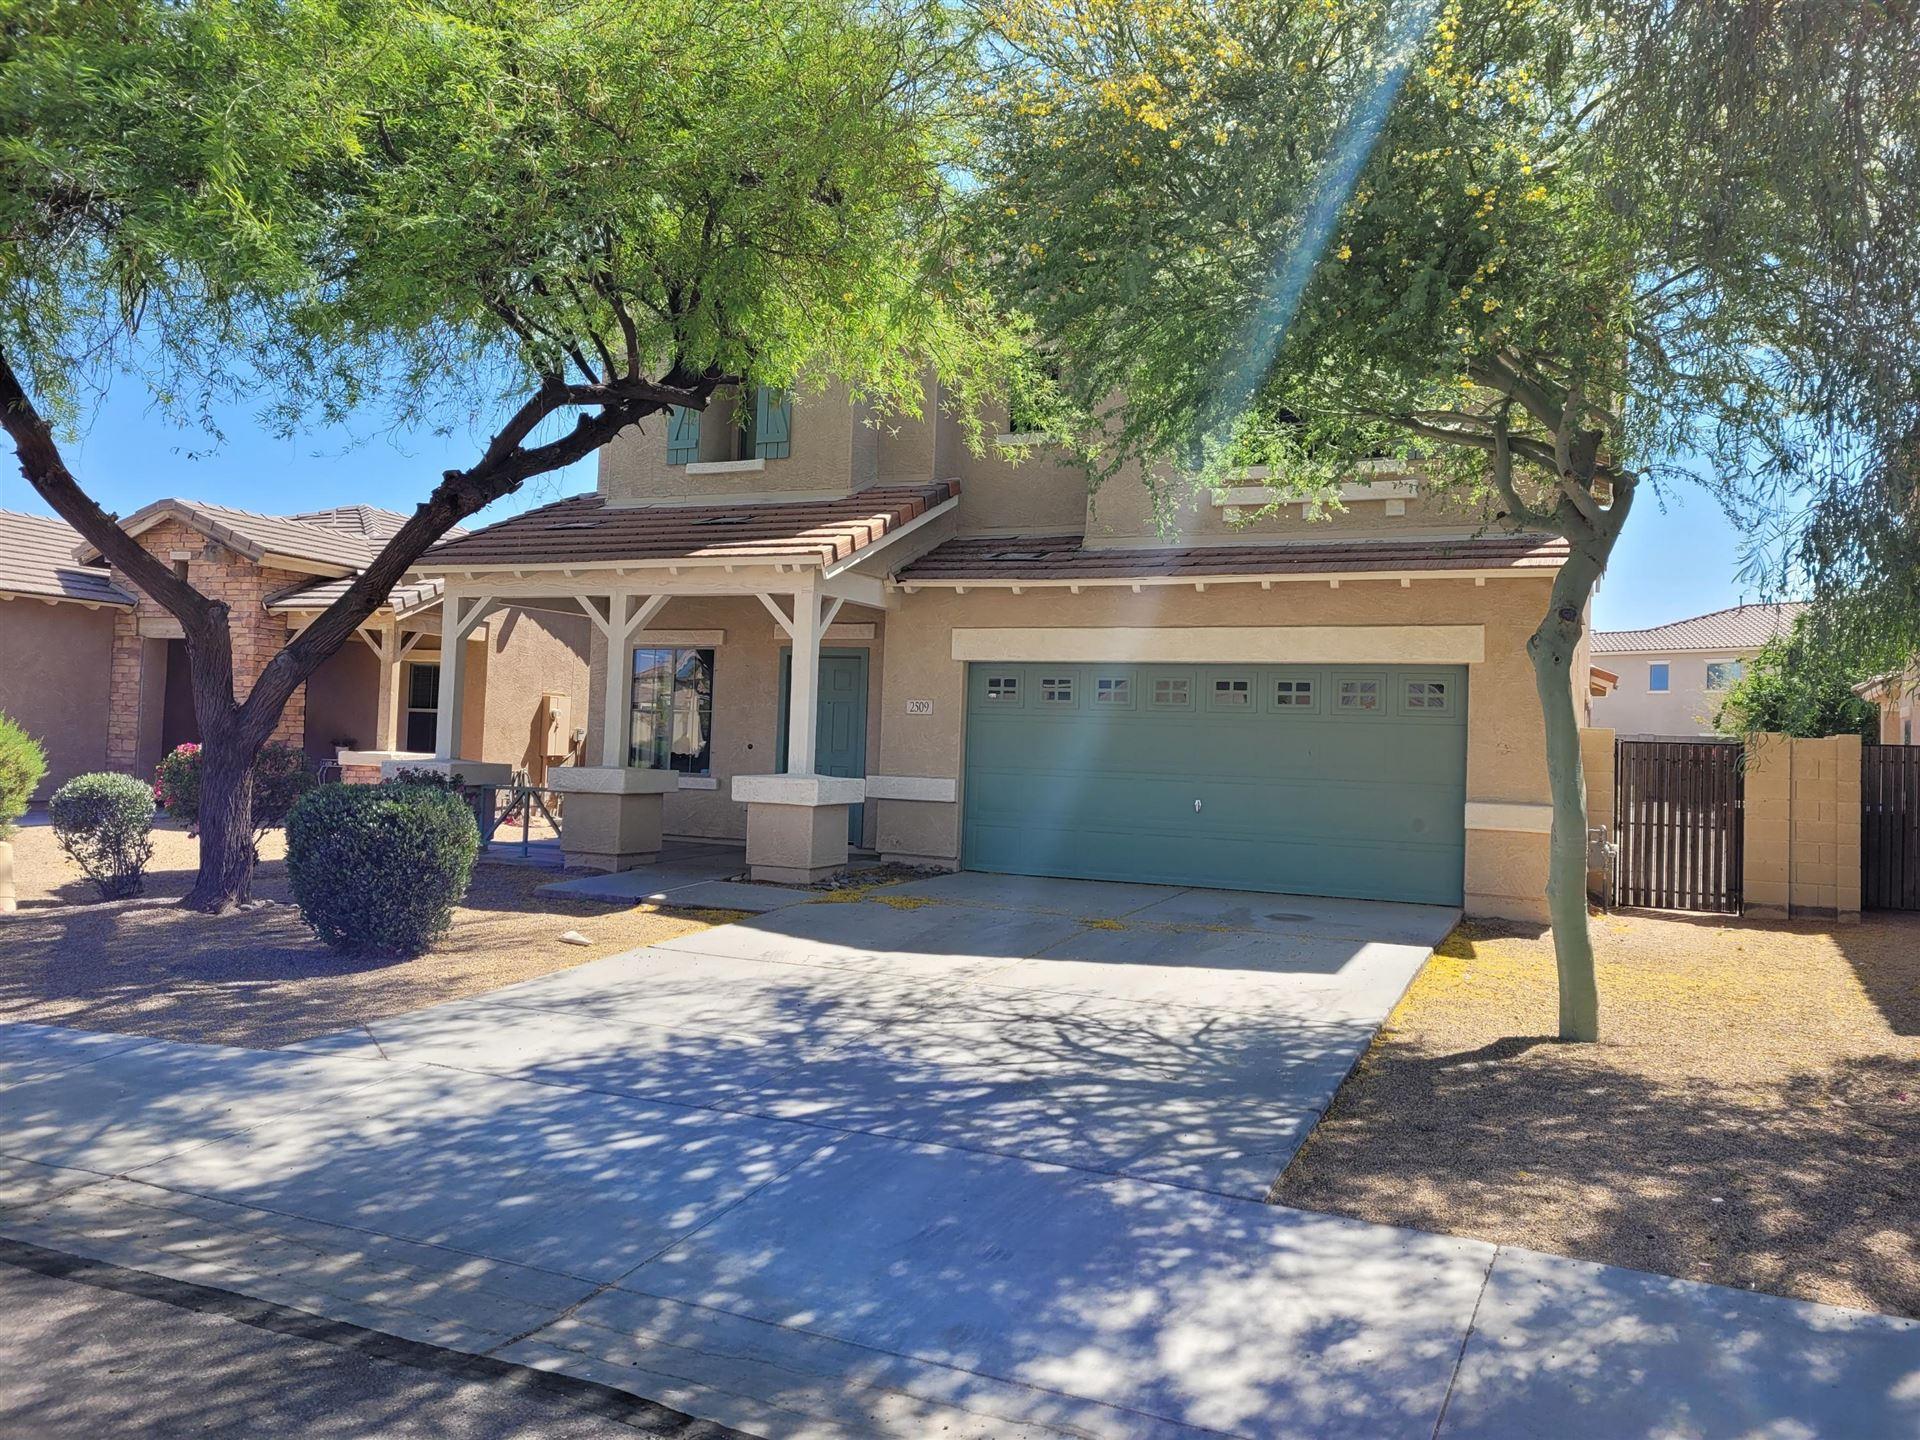 Photo of 2509 S 116TH Avenue, Avondale, AZ 85323 (MLS # 6229315)